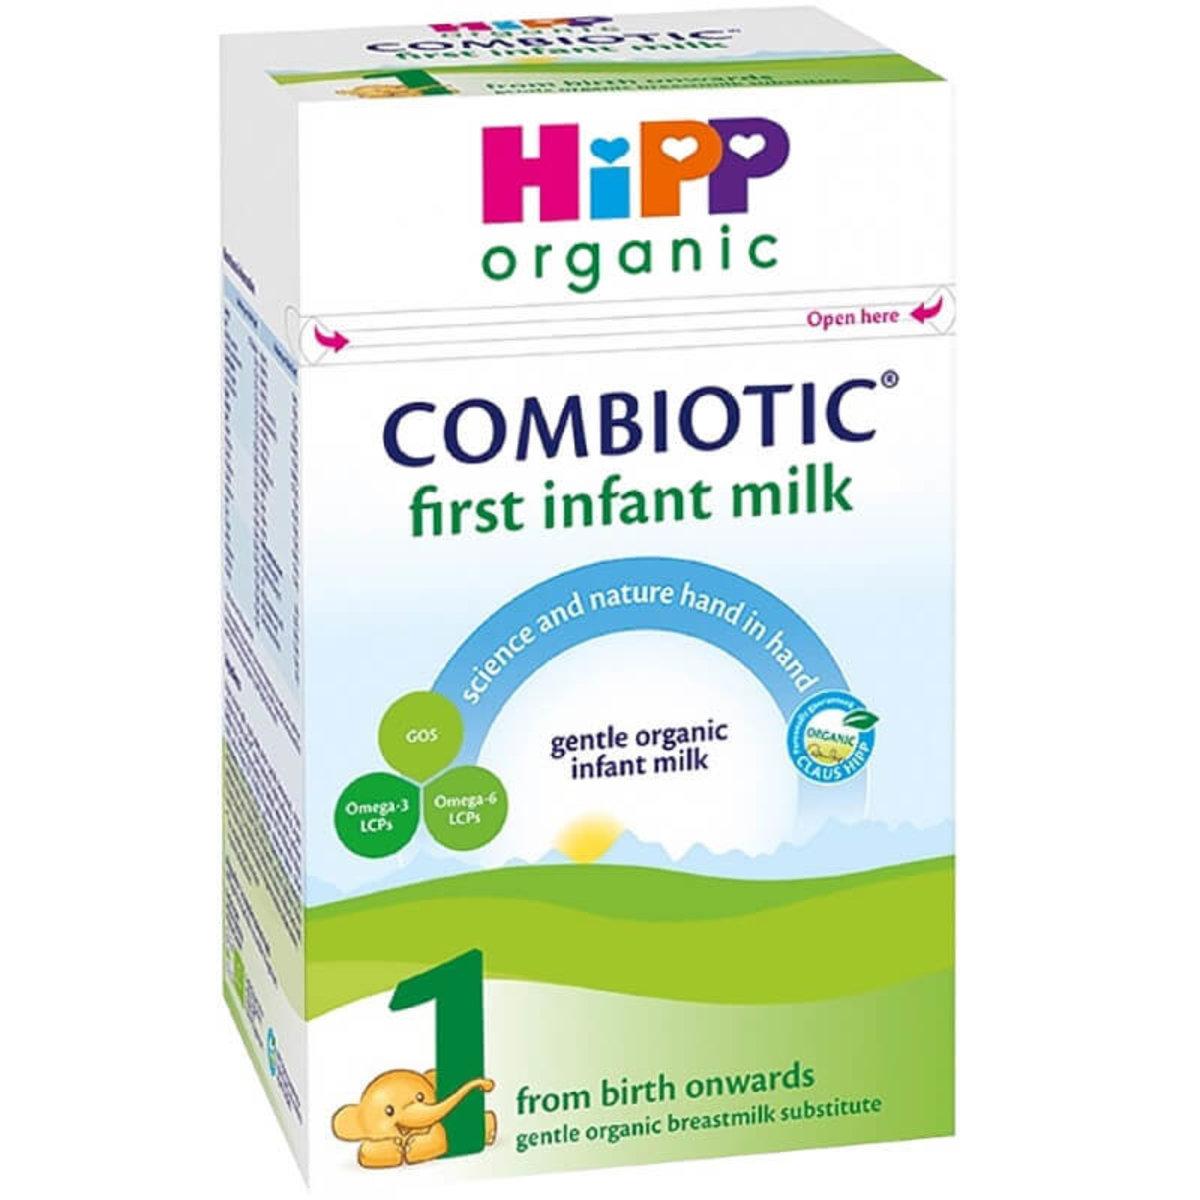 Hipp Organic (UK) 有機雙益嬰兒奶粉 (階段1 : 適合初生到6個月大的嬰兒) 800g